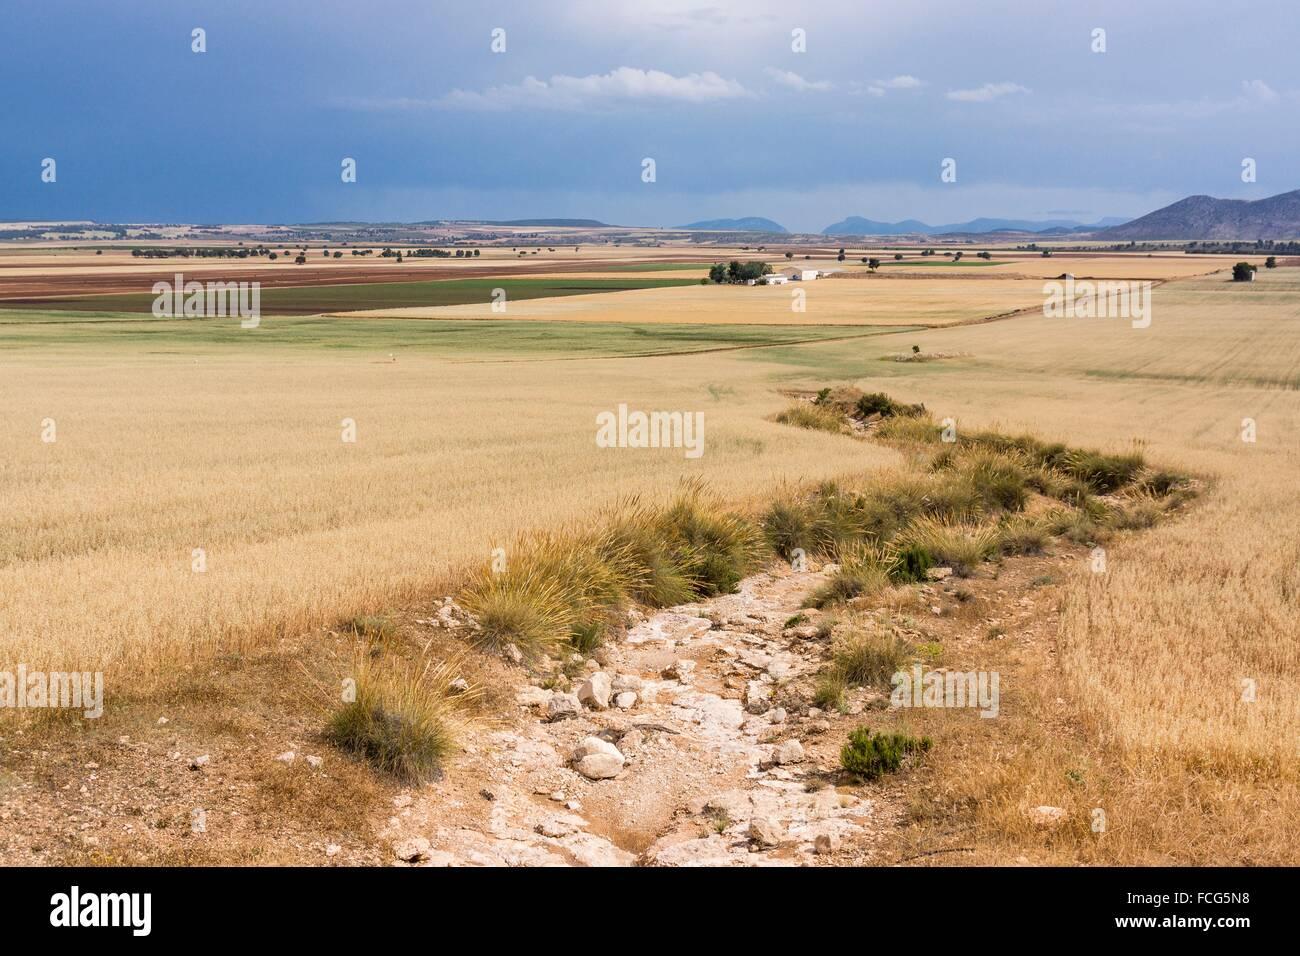 Campo de cereales bajo onu cielo de Lluvia, Murcia, Spagna. Immagini Stock